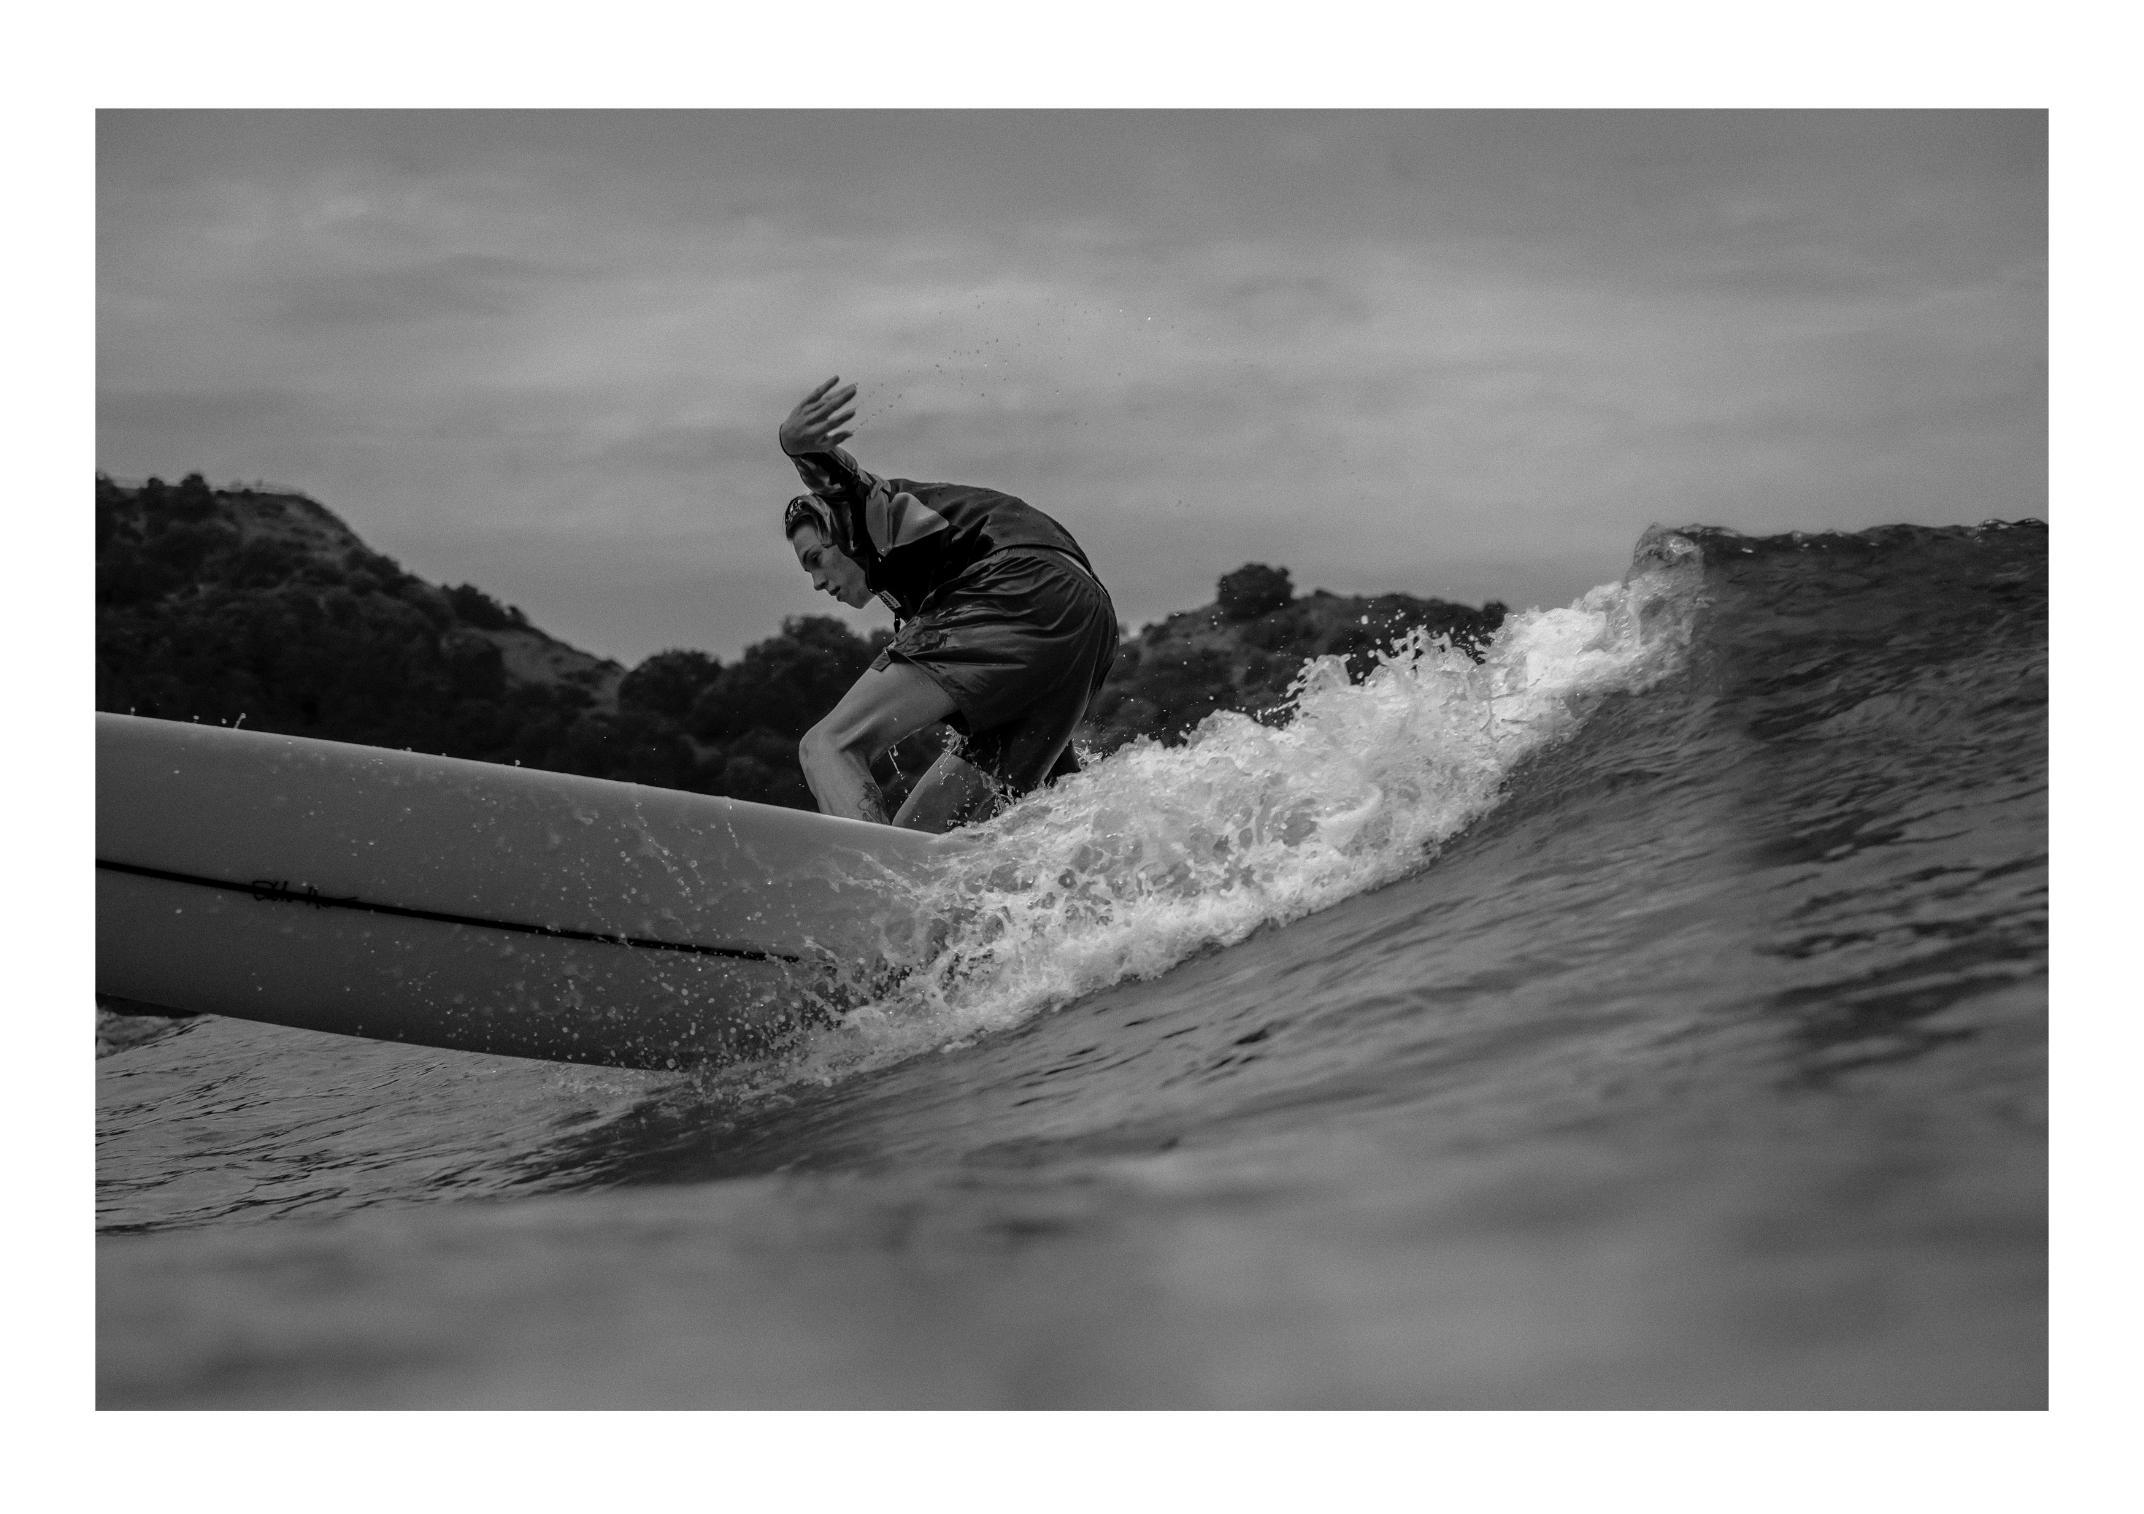 Fabien_voileau_salt_water_byron_bay_surf_Jye_whyatt_11